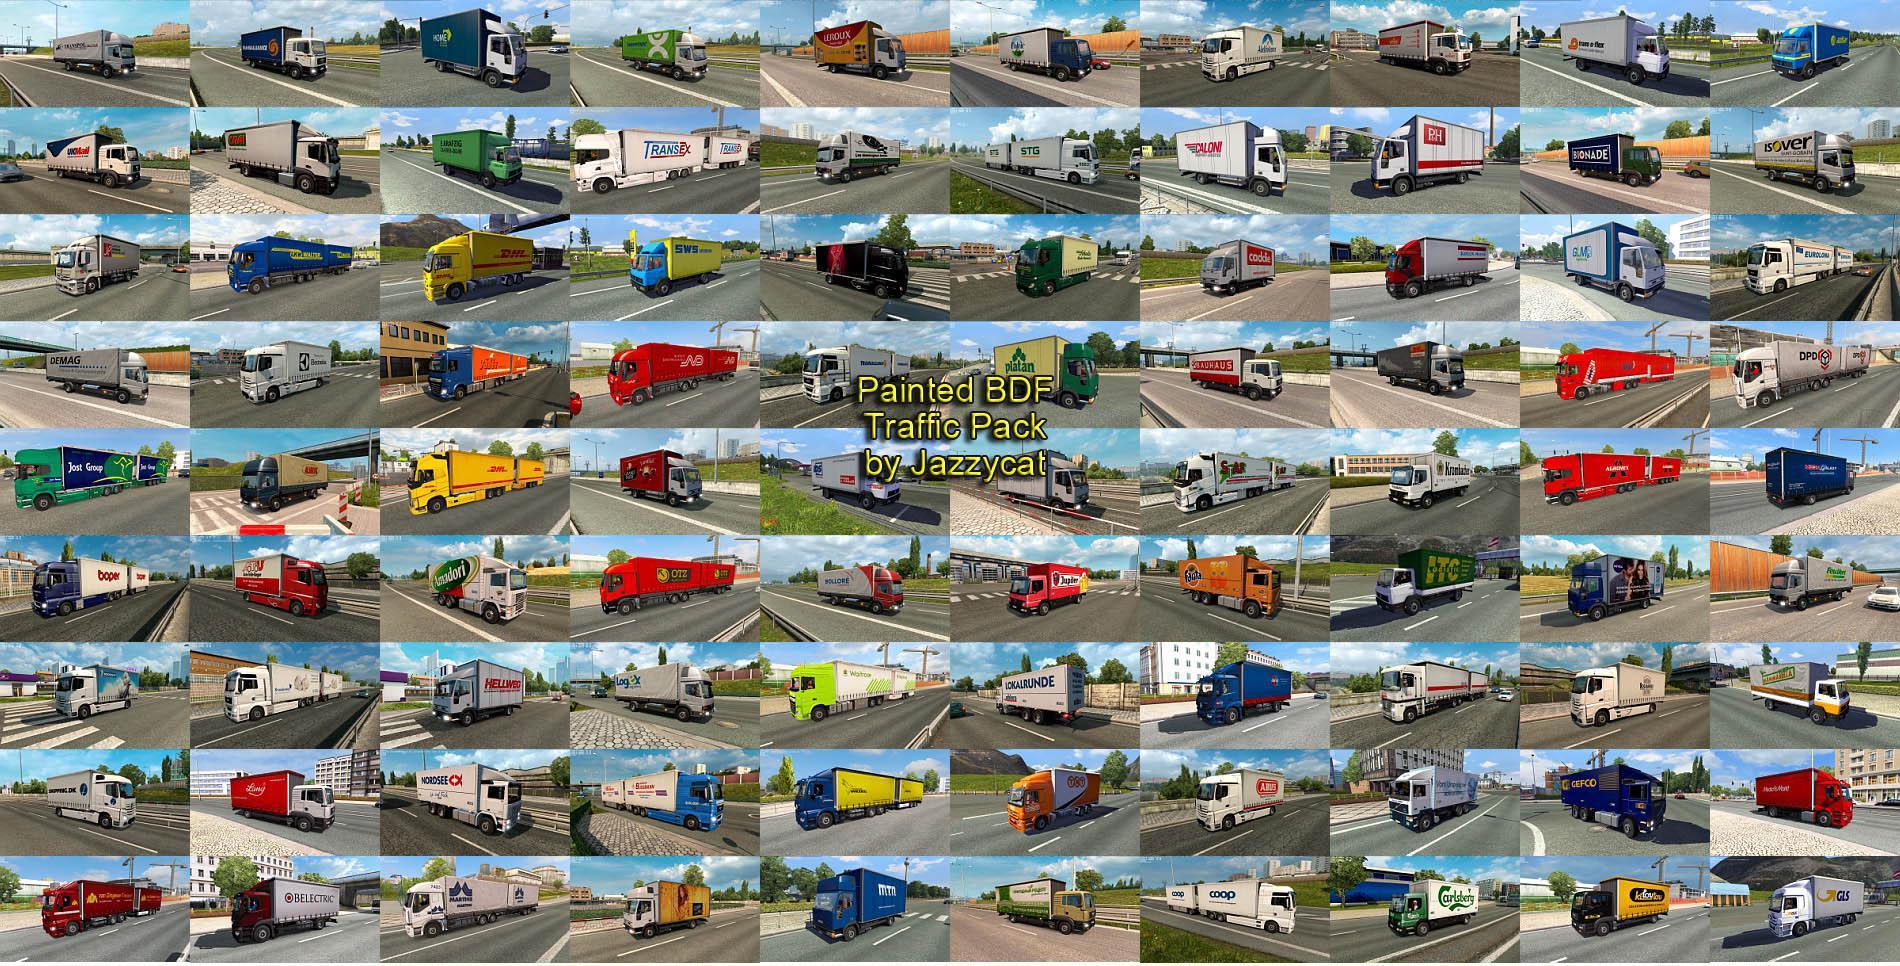 [Obrazek: painted-bdf-traffic-p1wkk4.jpg]